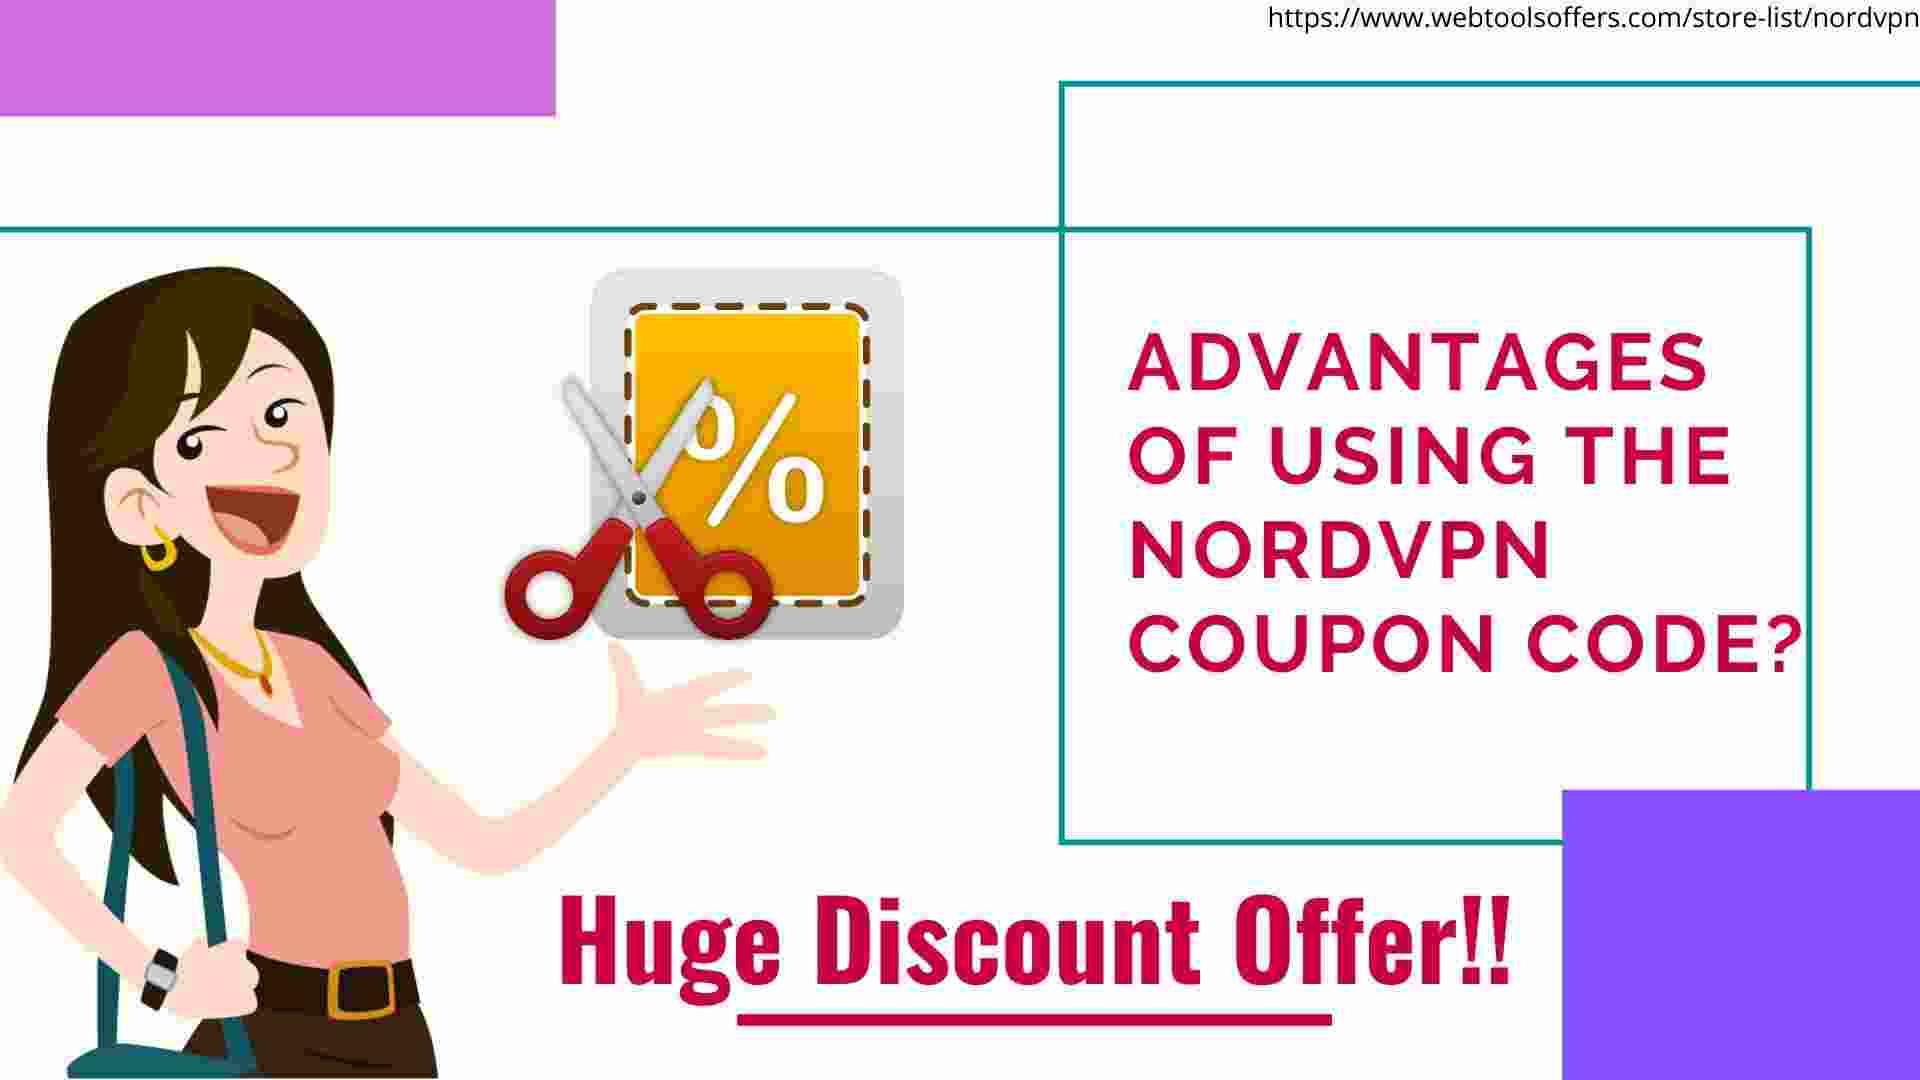 Benefits of NordVPN Coupon